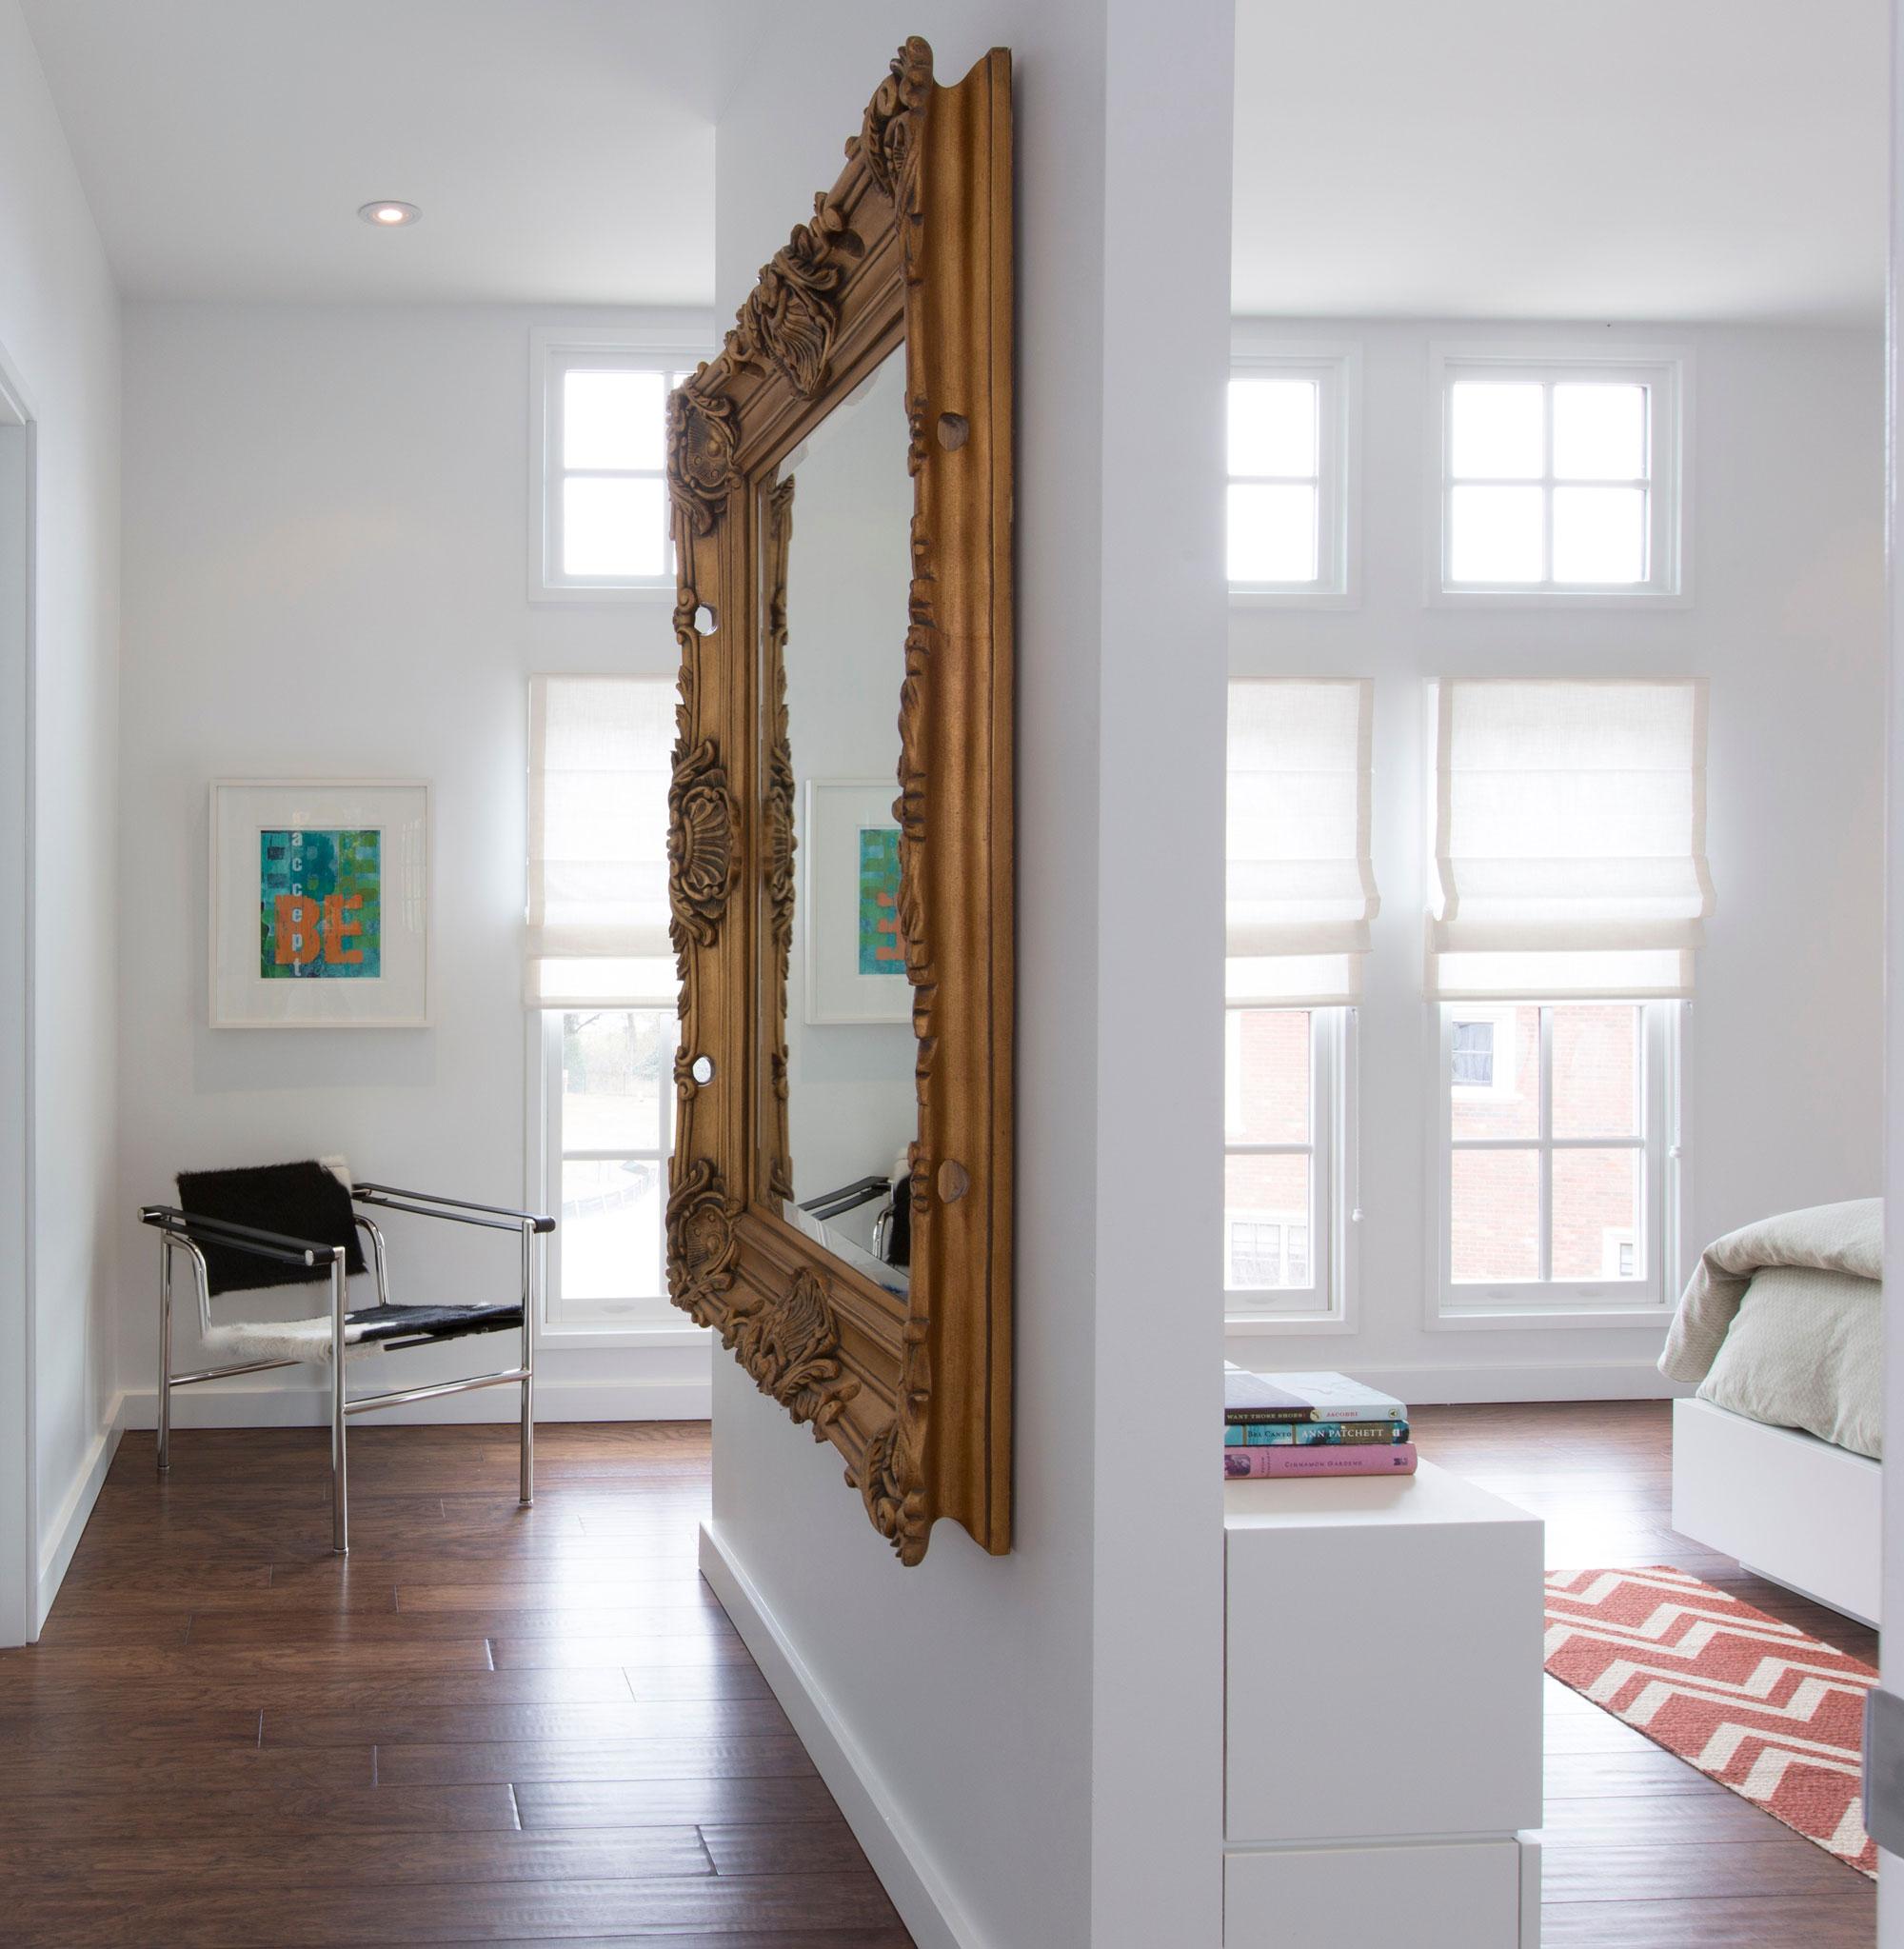 Chic Oglethorpe Home in Atlanta by Cecconi Simone-13